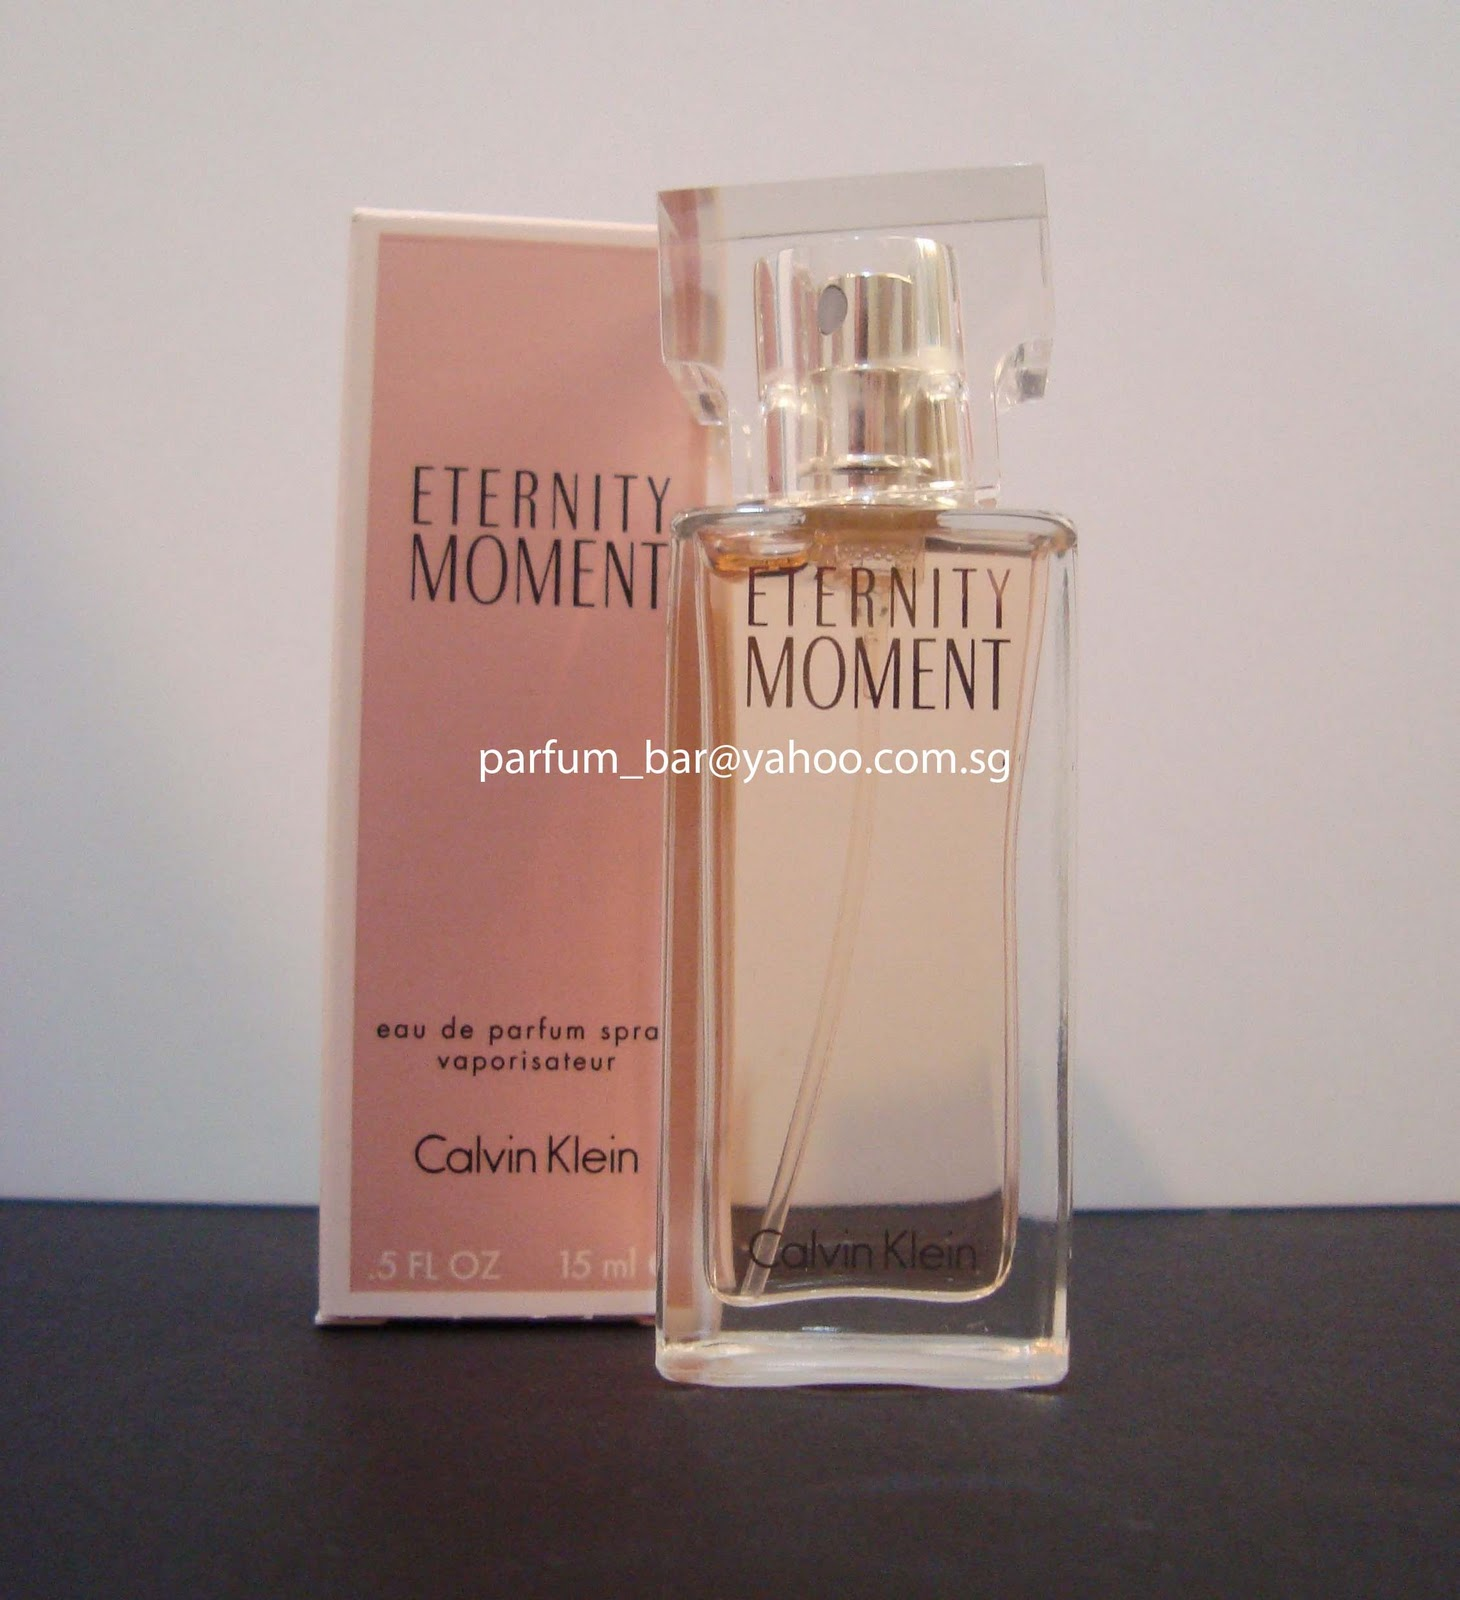 calvin klein eternity moment 100ml eau de parfum from the. Black Bedroom Furniture Sets. Home Design Ideas